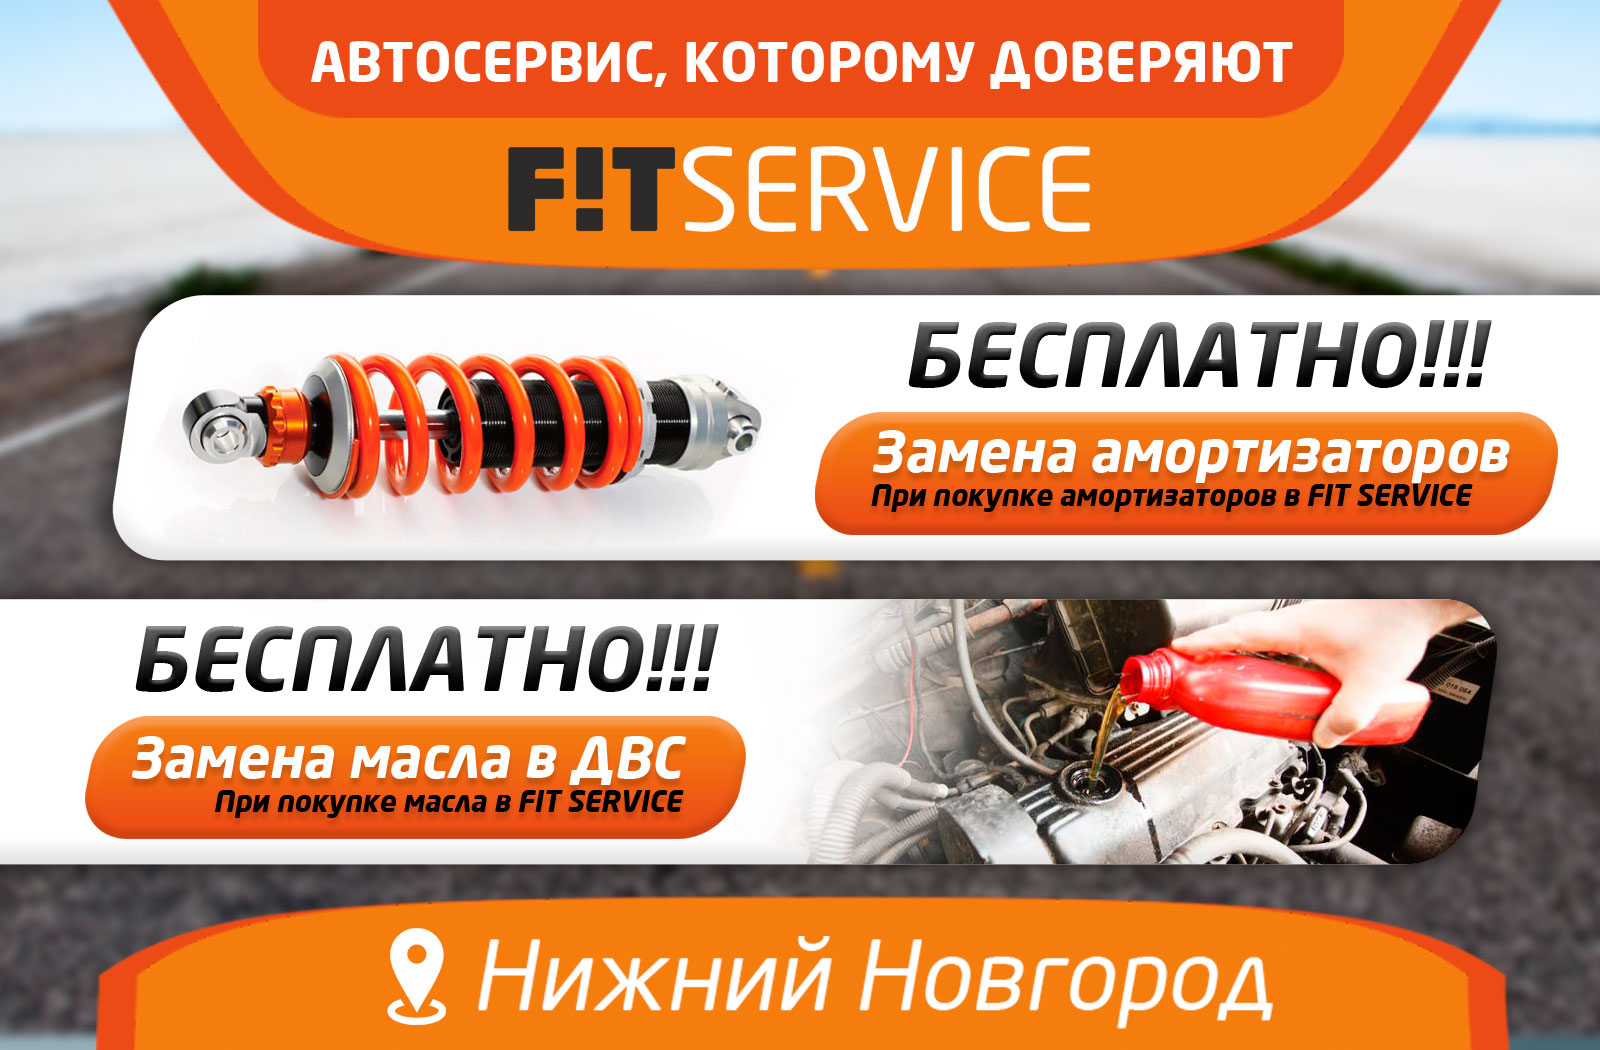 F!T Service (Автосервис) - Баннеры